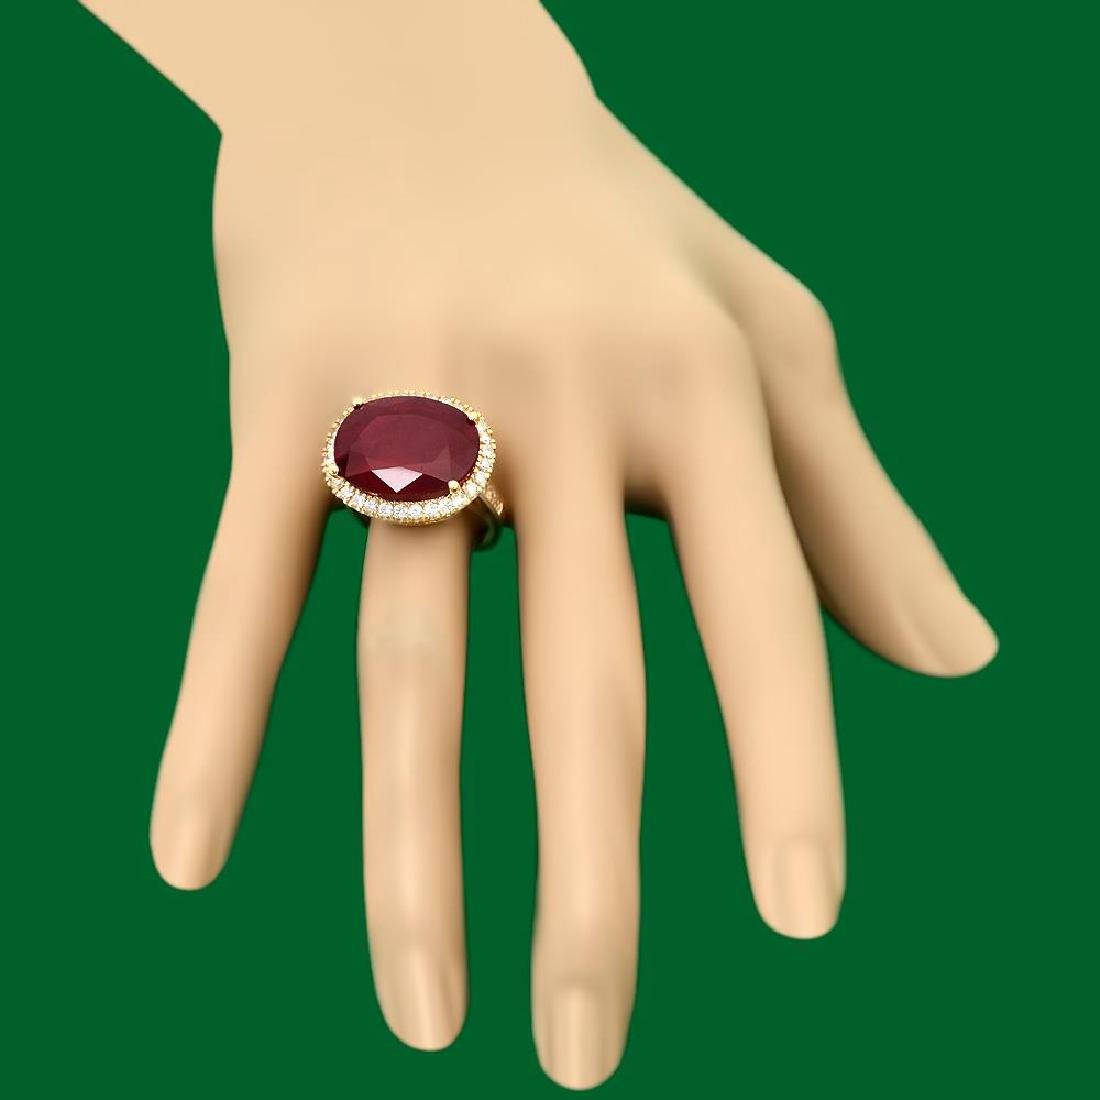 14k Gold 18.30ct Ruby 1.10ct Diamond Ring - 3